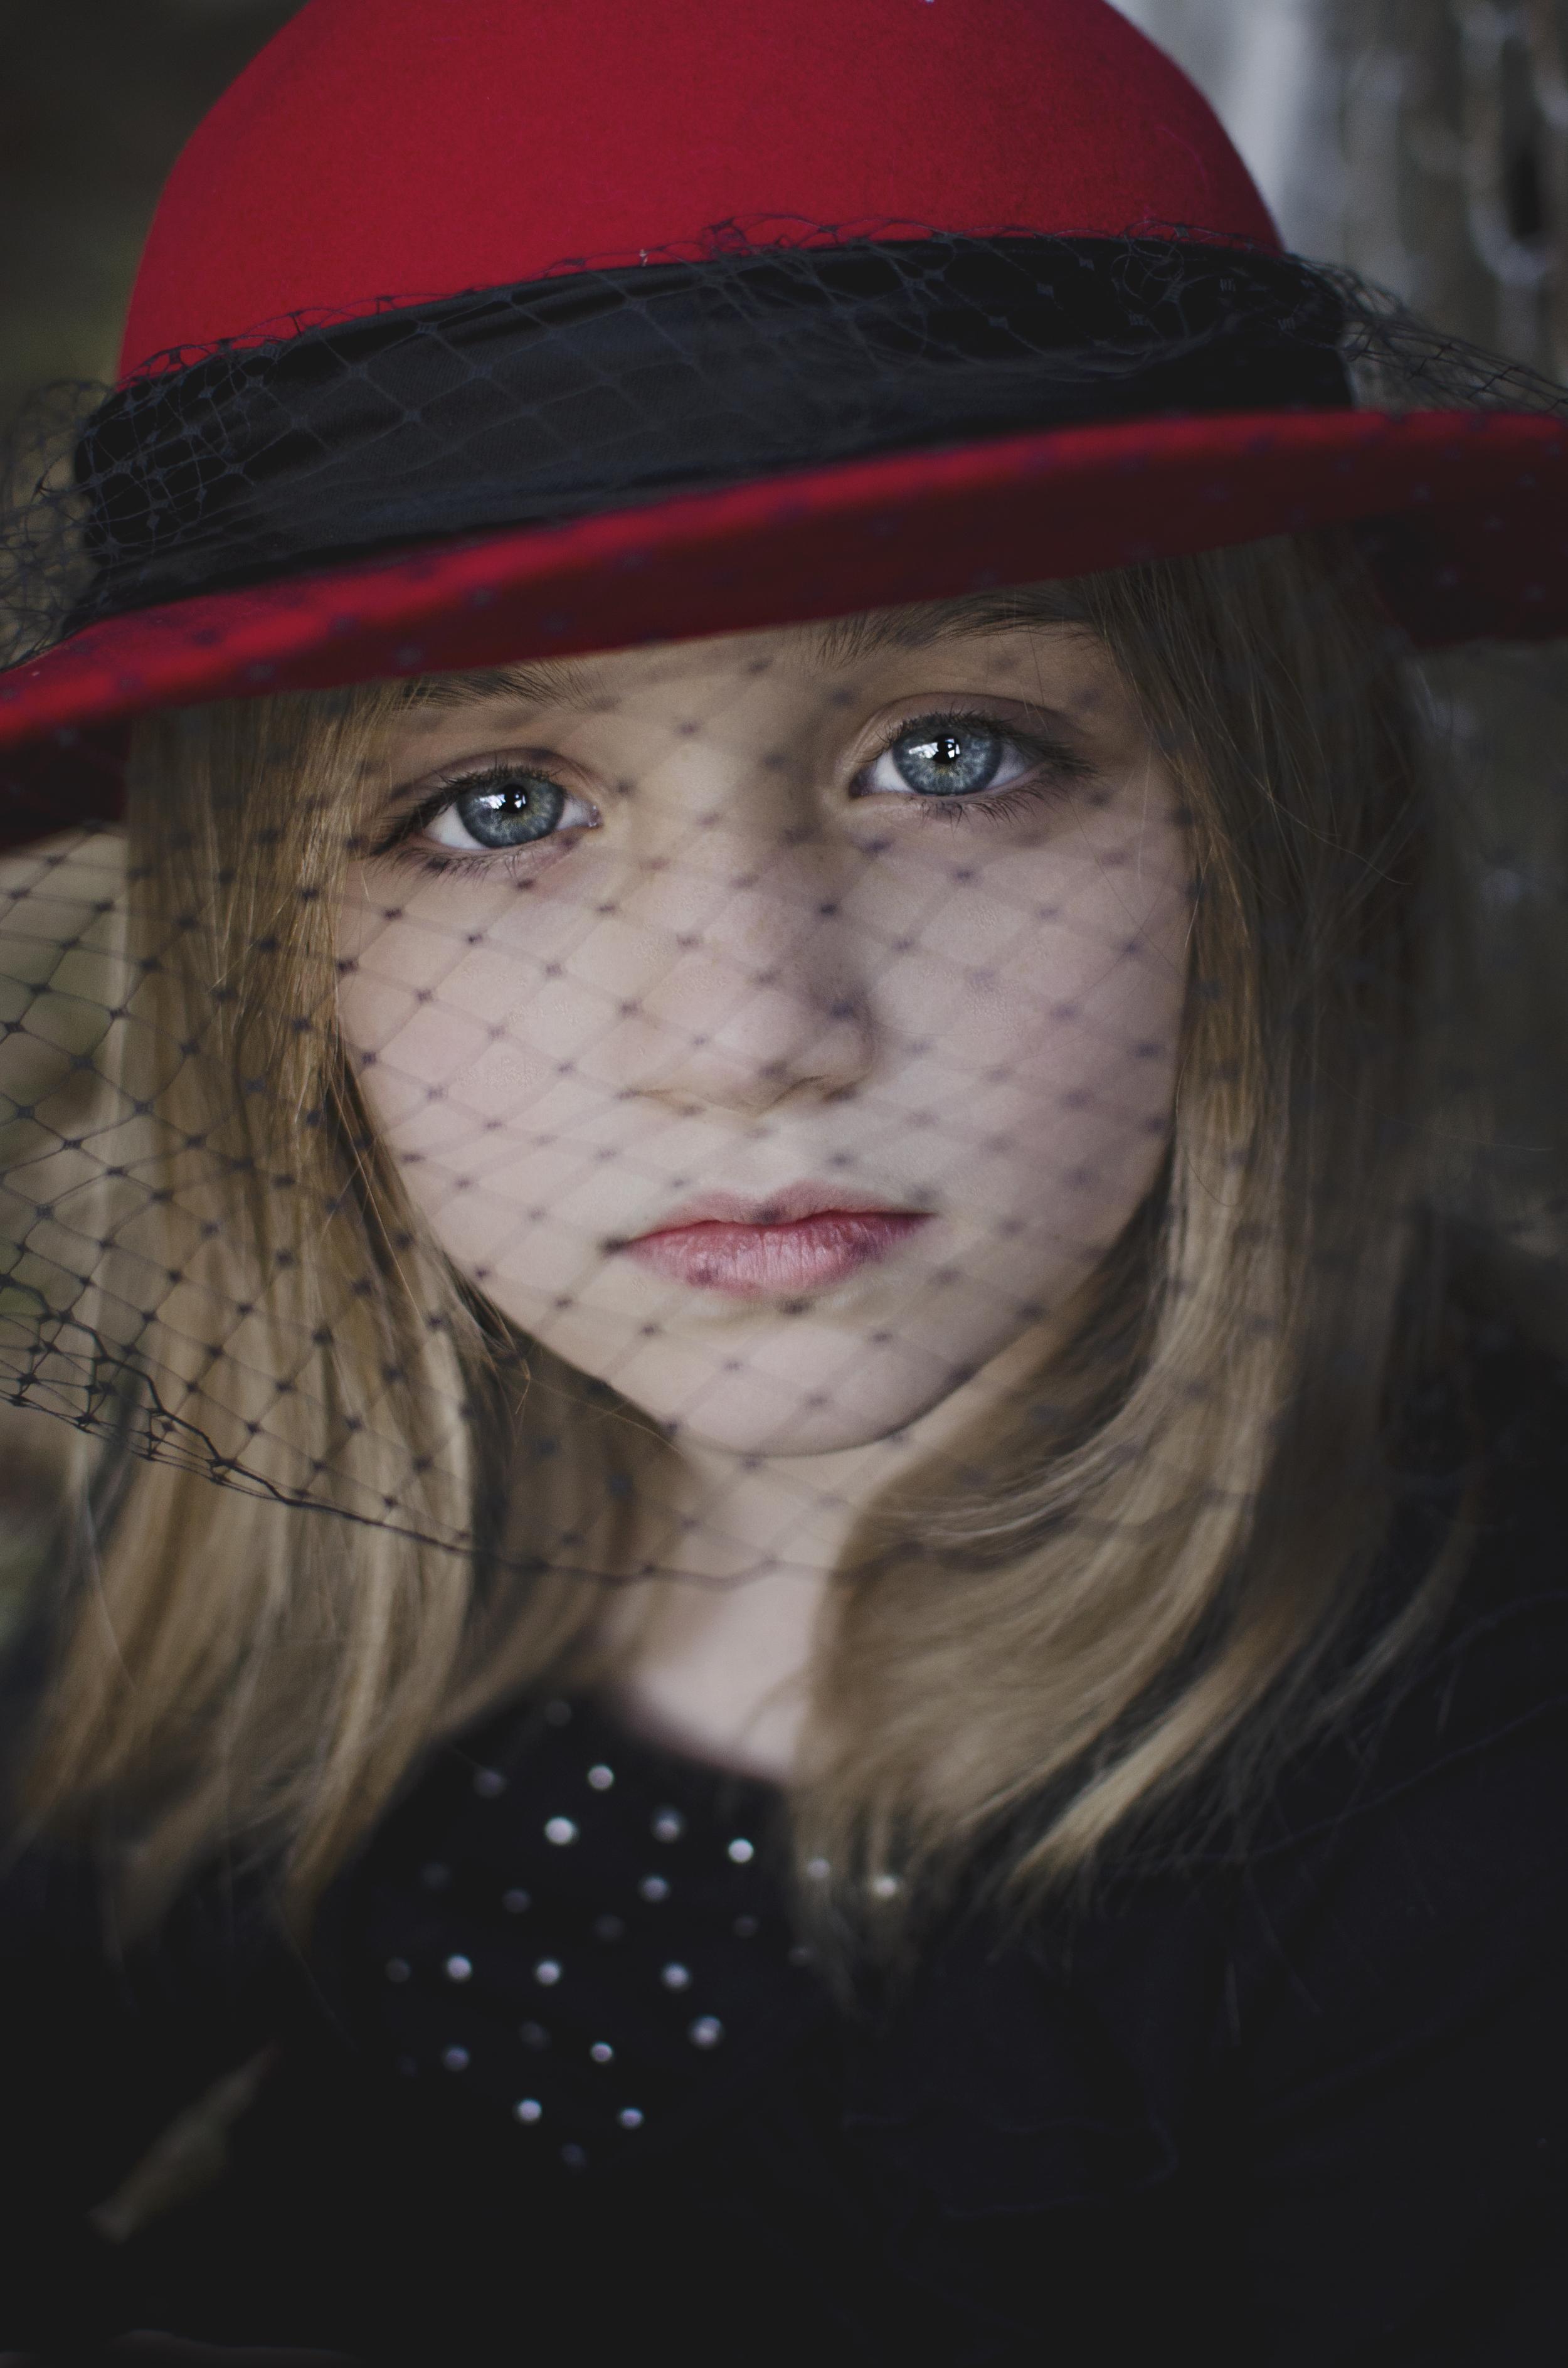 All Images 2012-2014 © Copyright Hannah Lamitina Photography